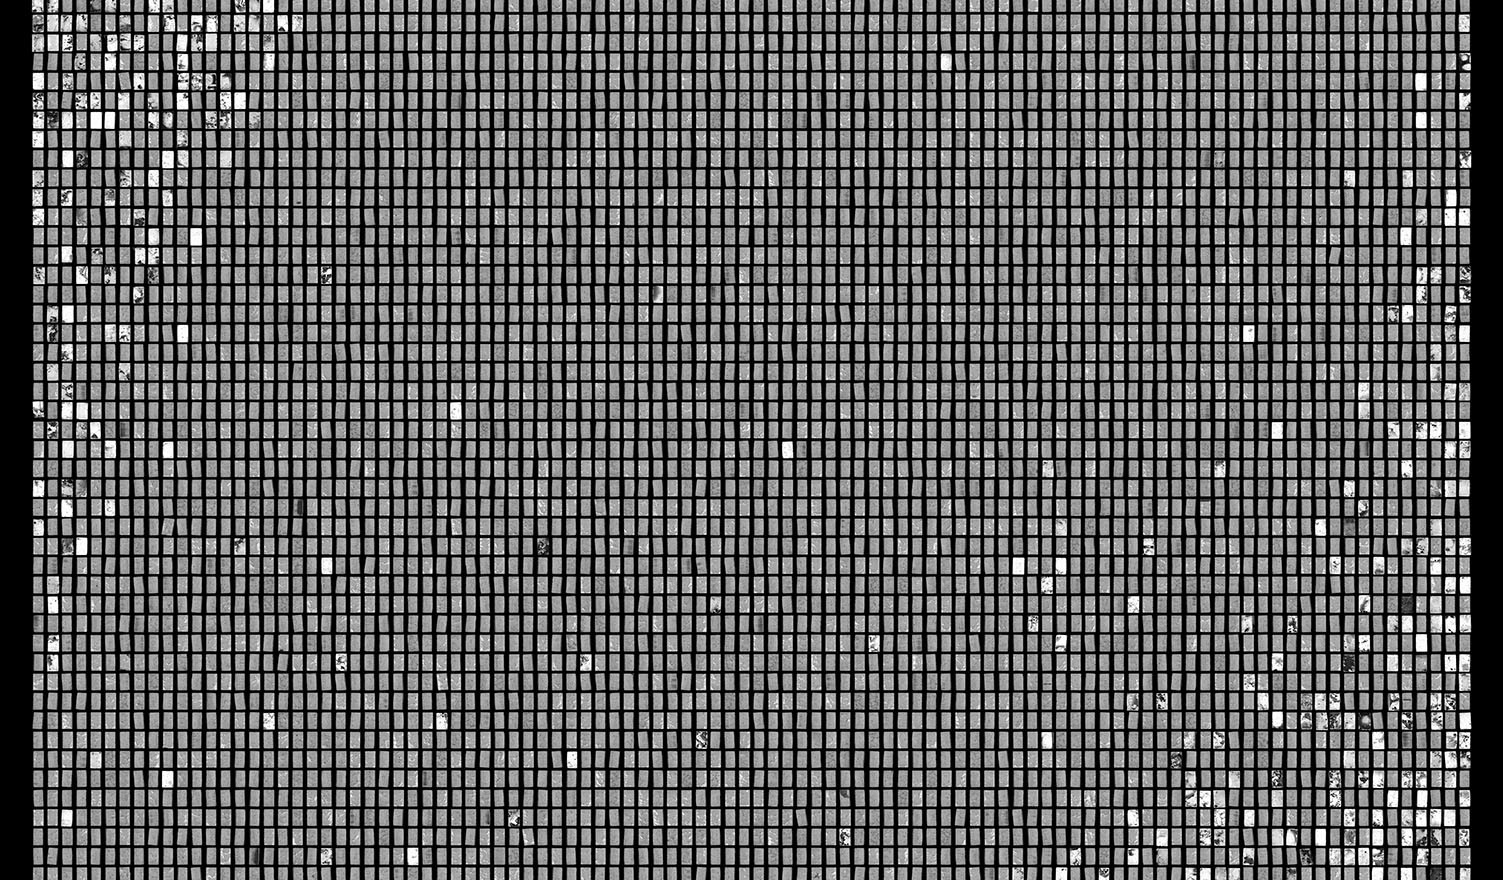 Society 026 193x145cm 145x110cm Pigment Inkjet  2017